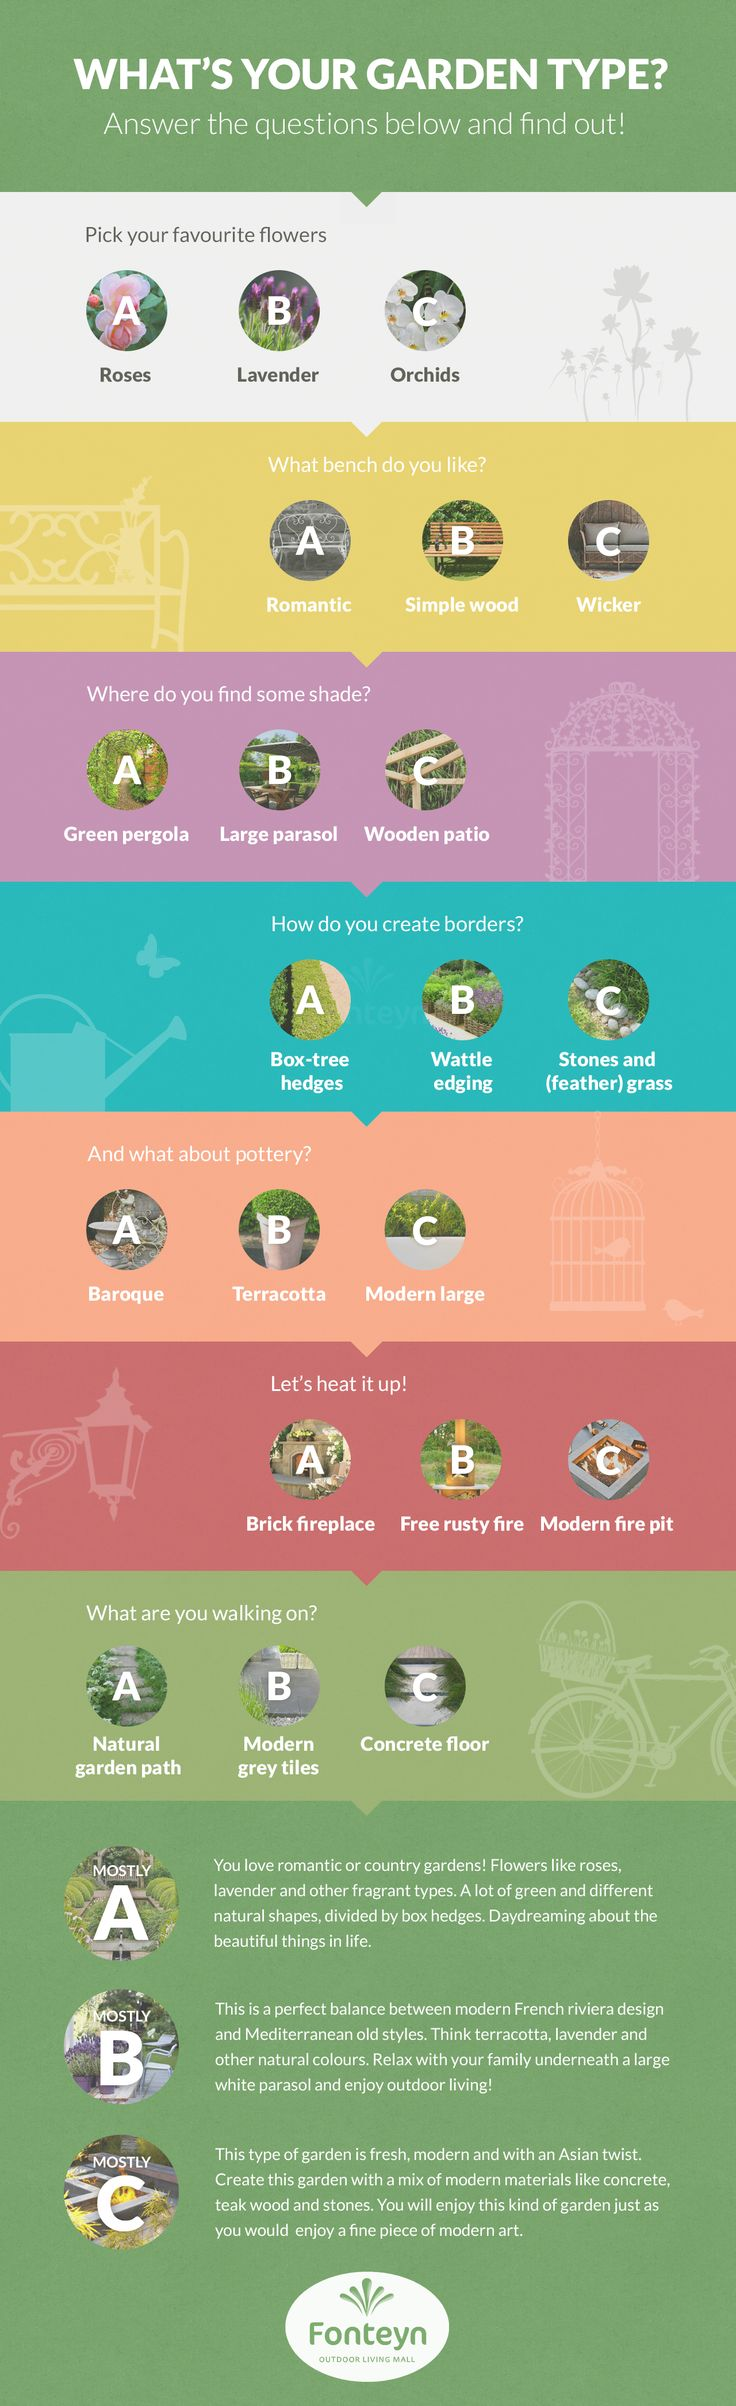 Copy this Garden Quiz on your website!   #garden #quiz #infographic #tuin #Fonteyn    Add the link:  http://www.fonteyn.nl/tuinmeubelen/   COPYRIGHT!